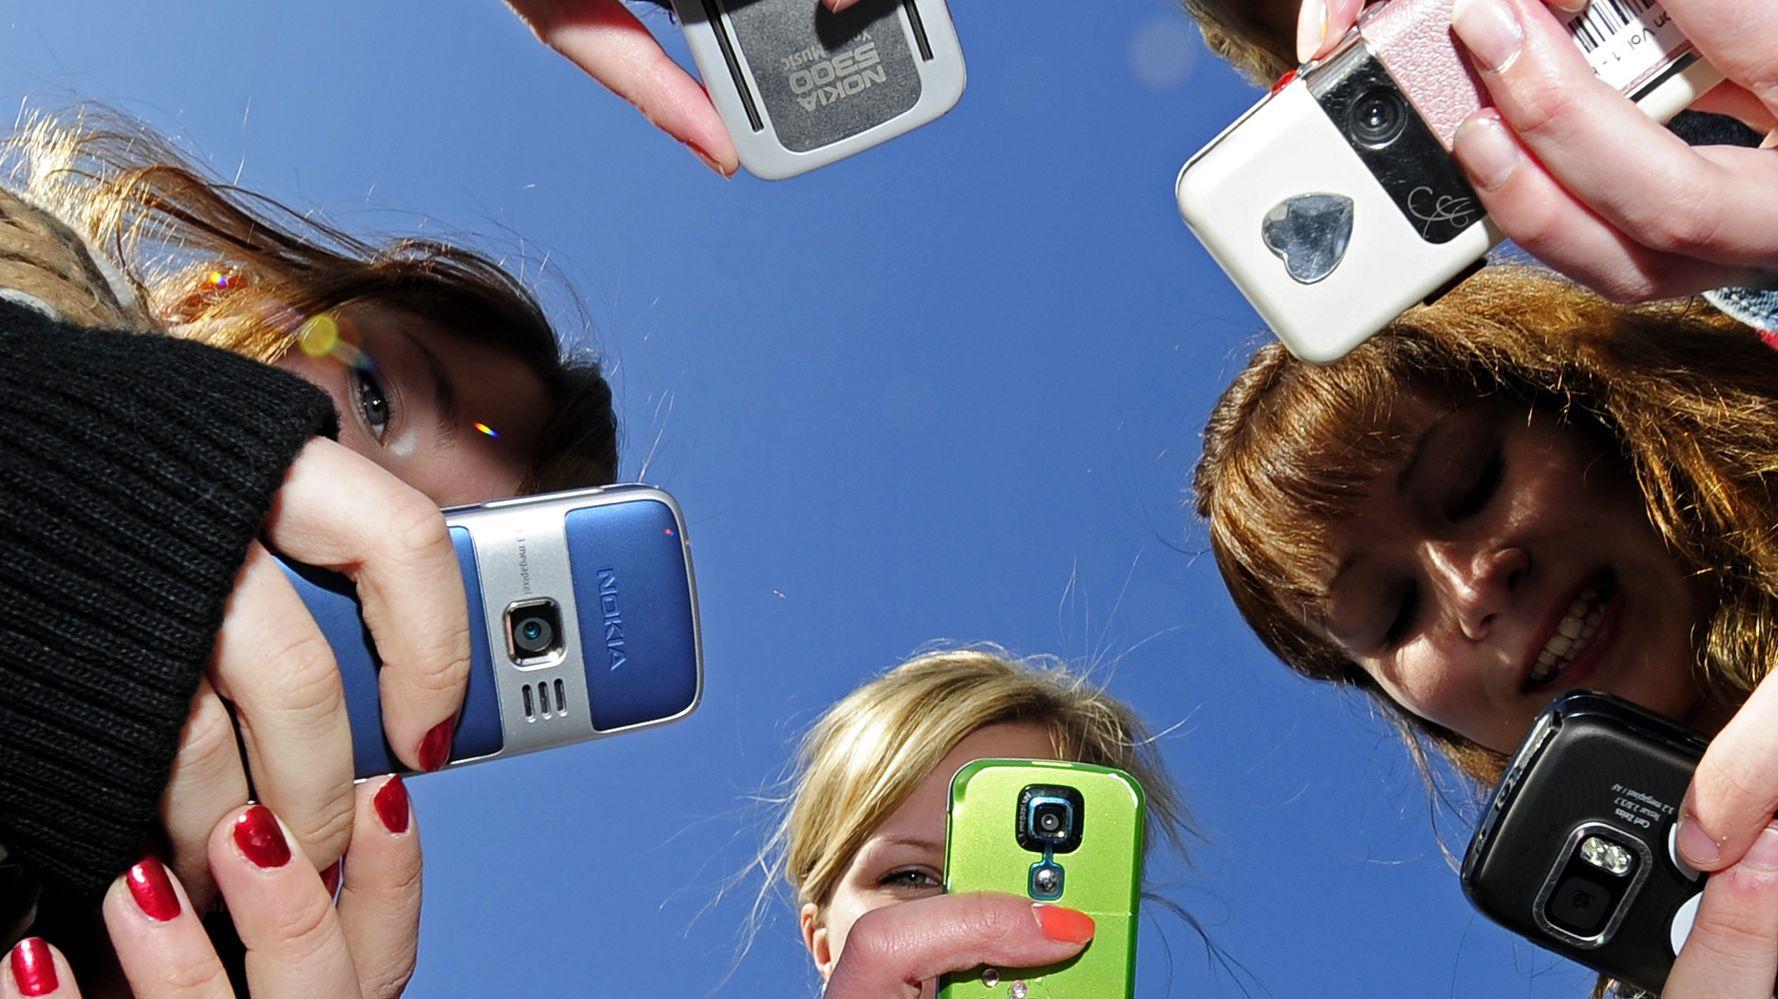 Tap To Wake Up Nokia 2